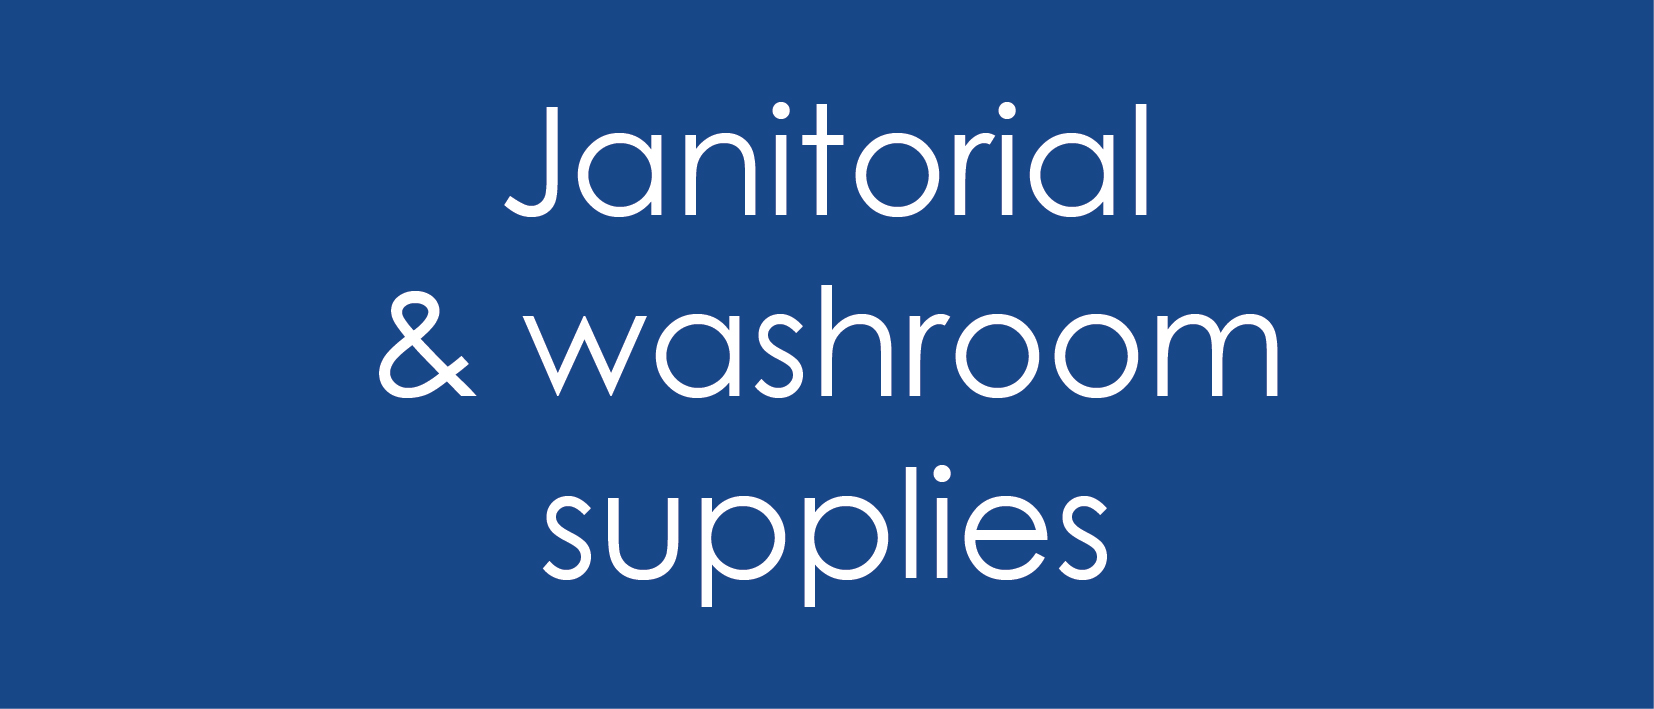 Janitorial & washroom supplies button blue.jpg